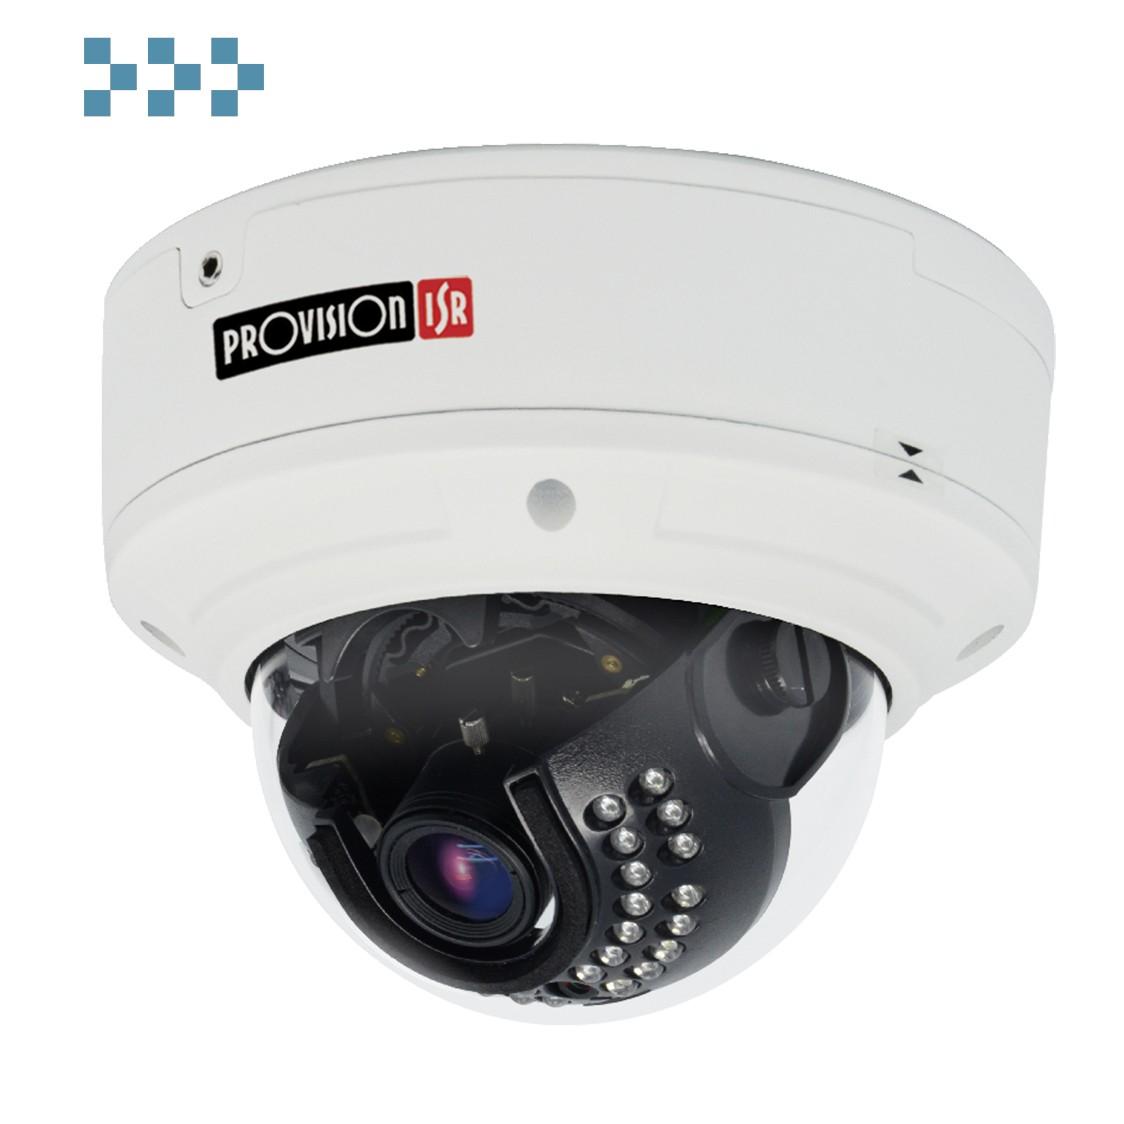 IP видеокамера Provision-ISR DAI+250IP5MVF